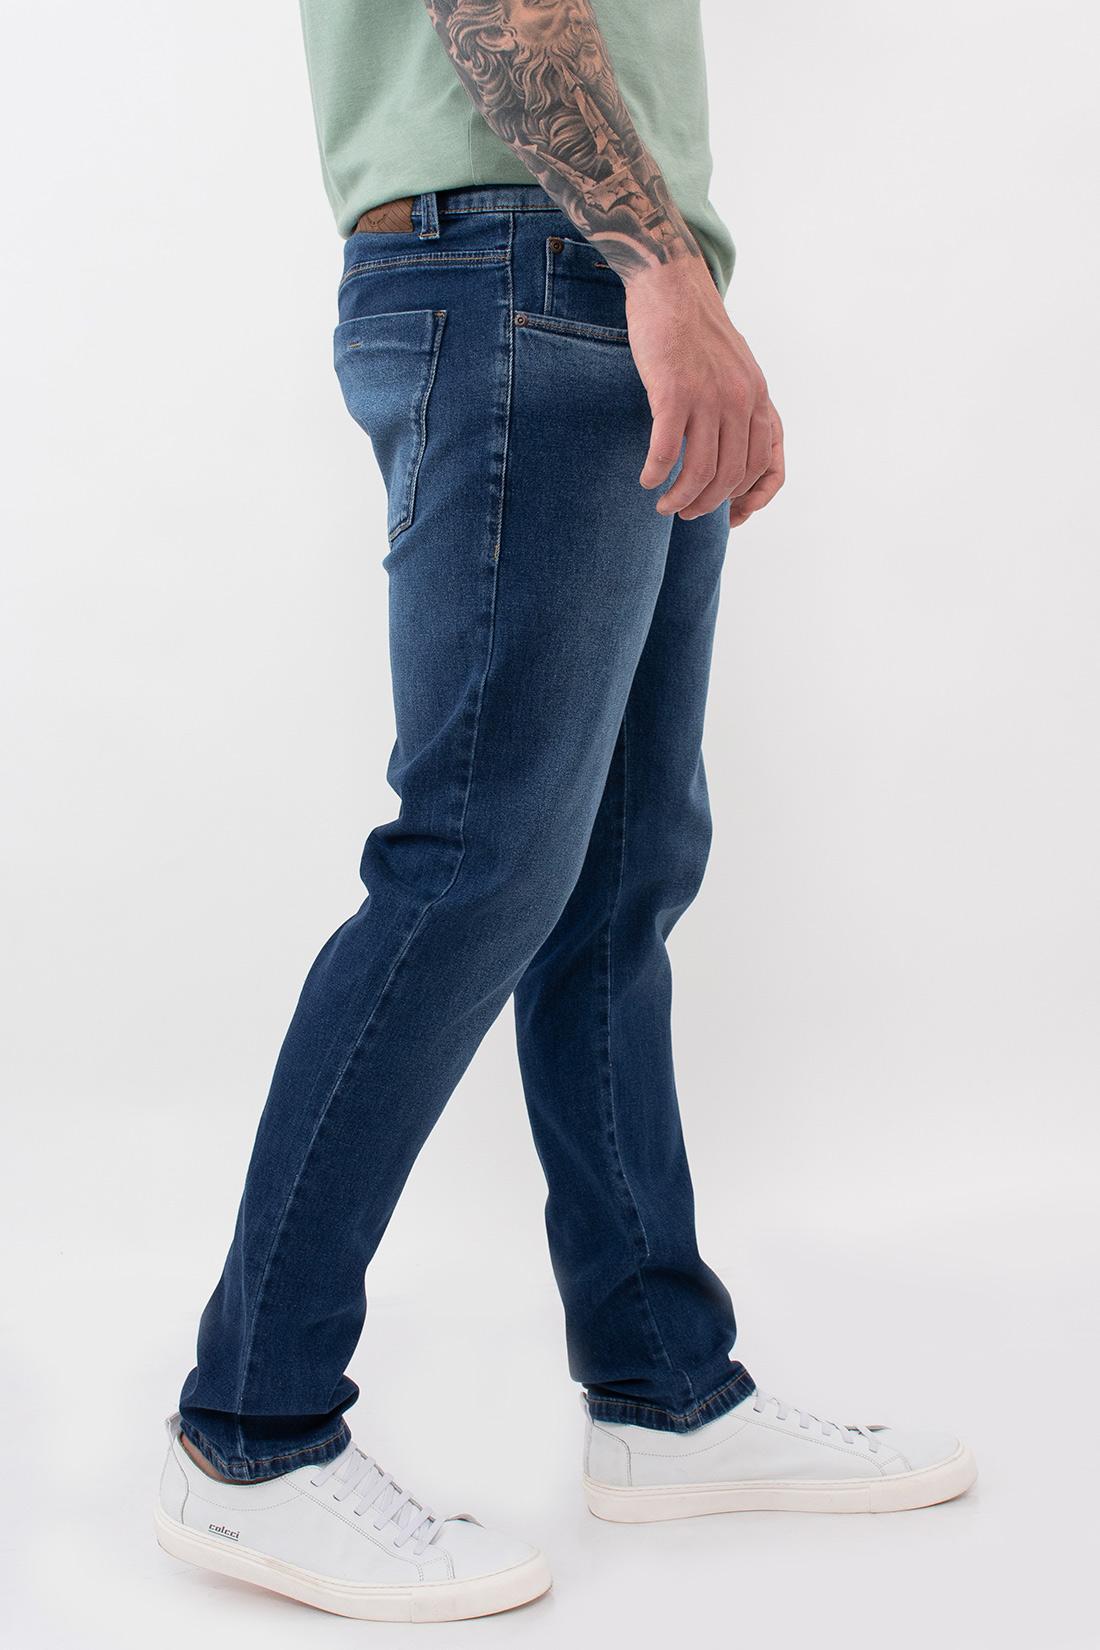 Calca Jeans Kacolako Slim Hiper